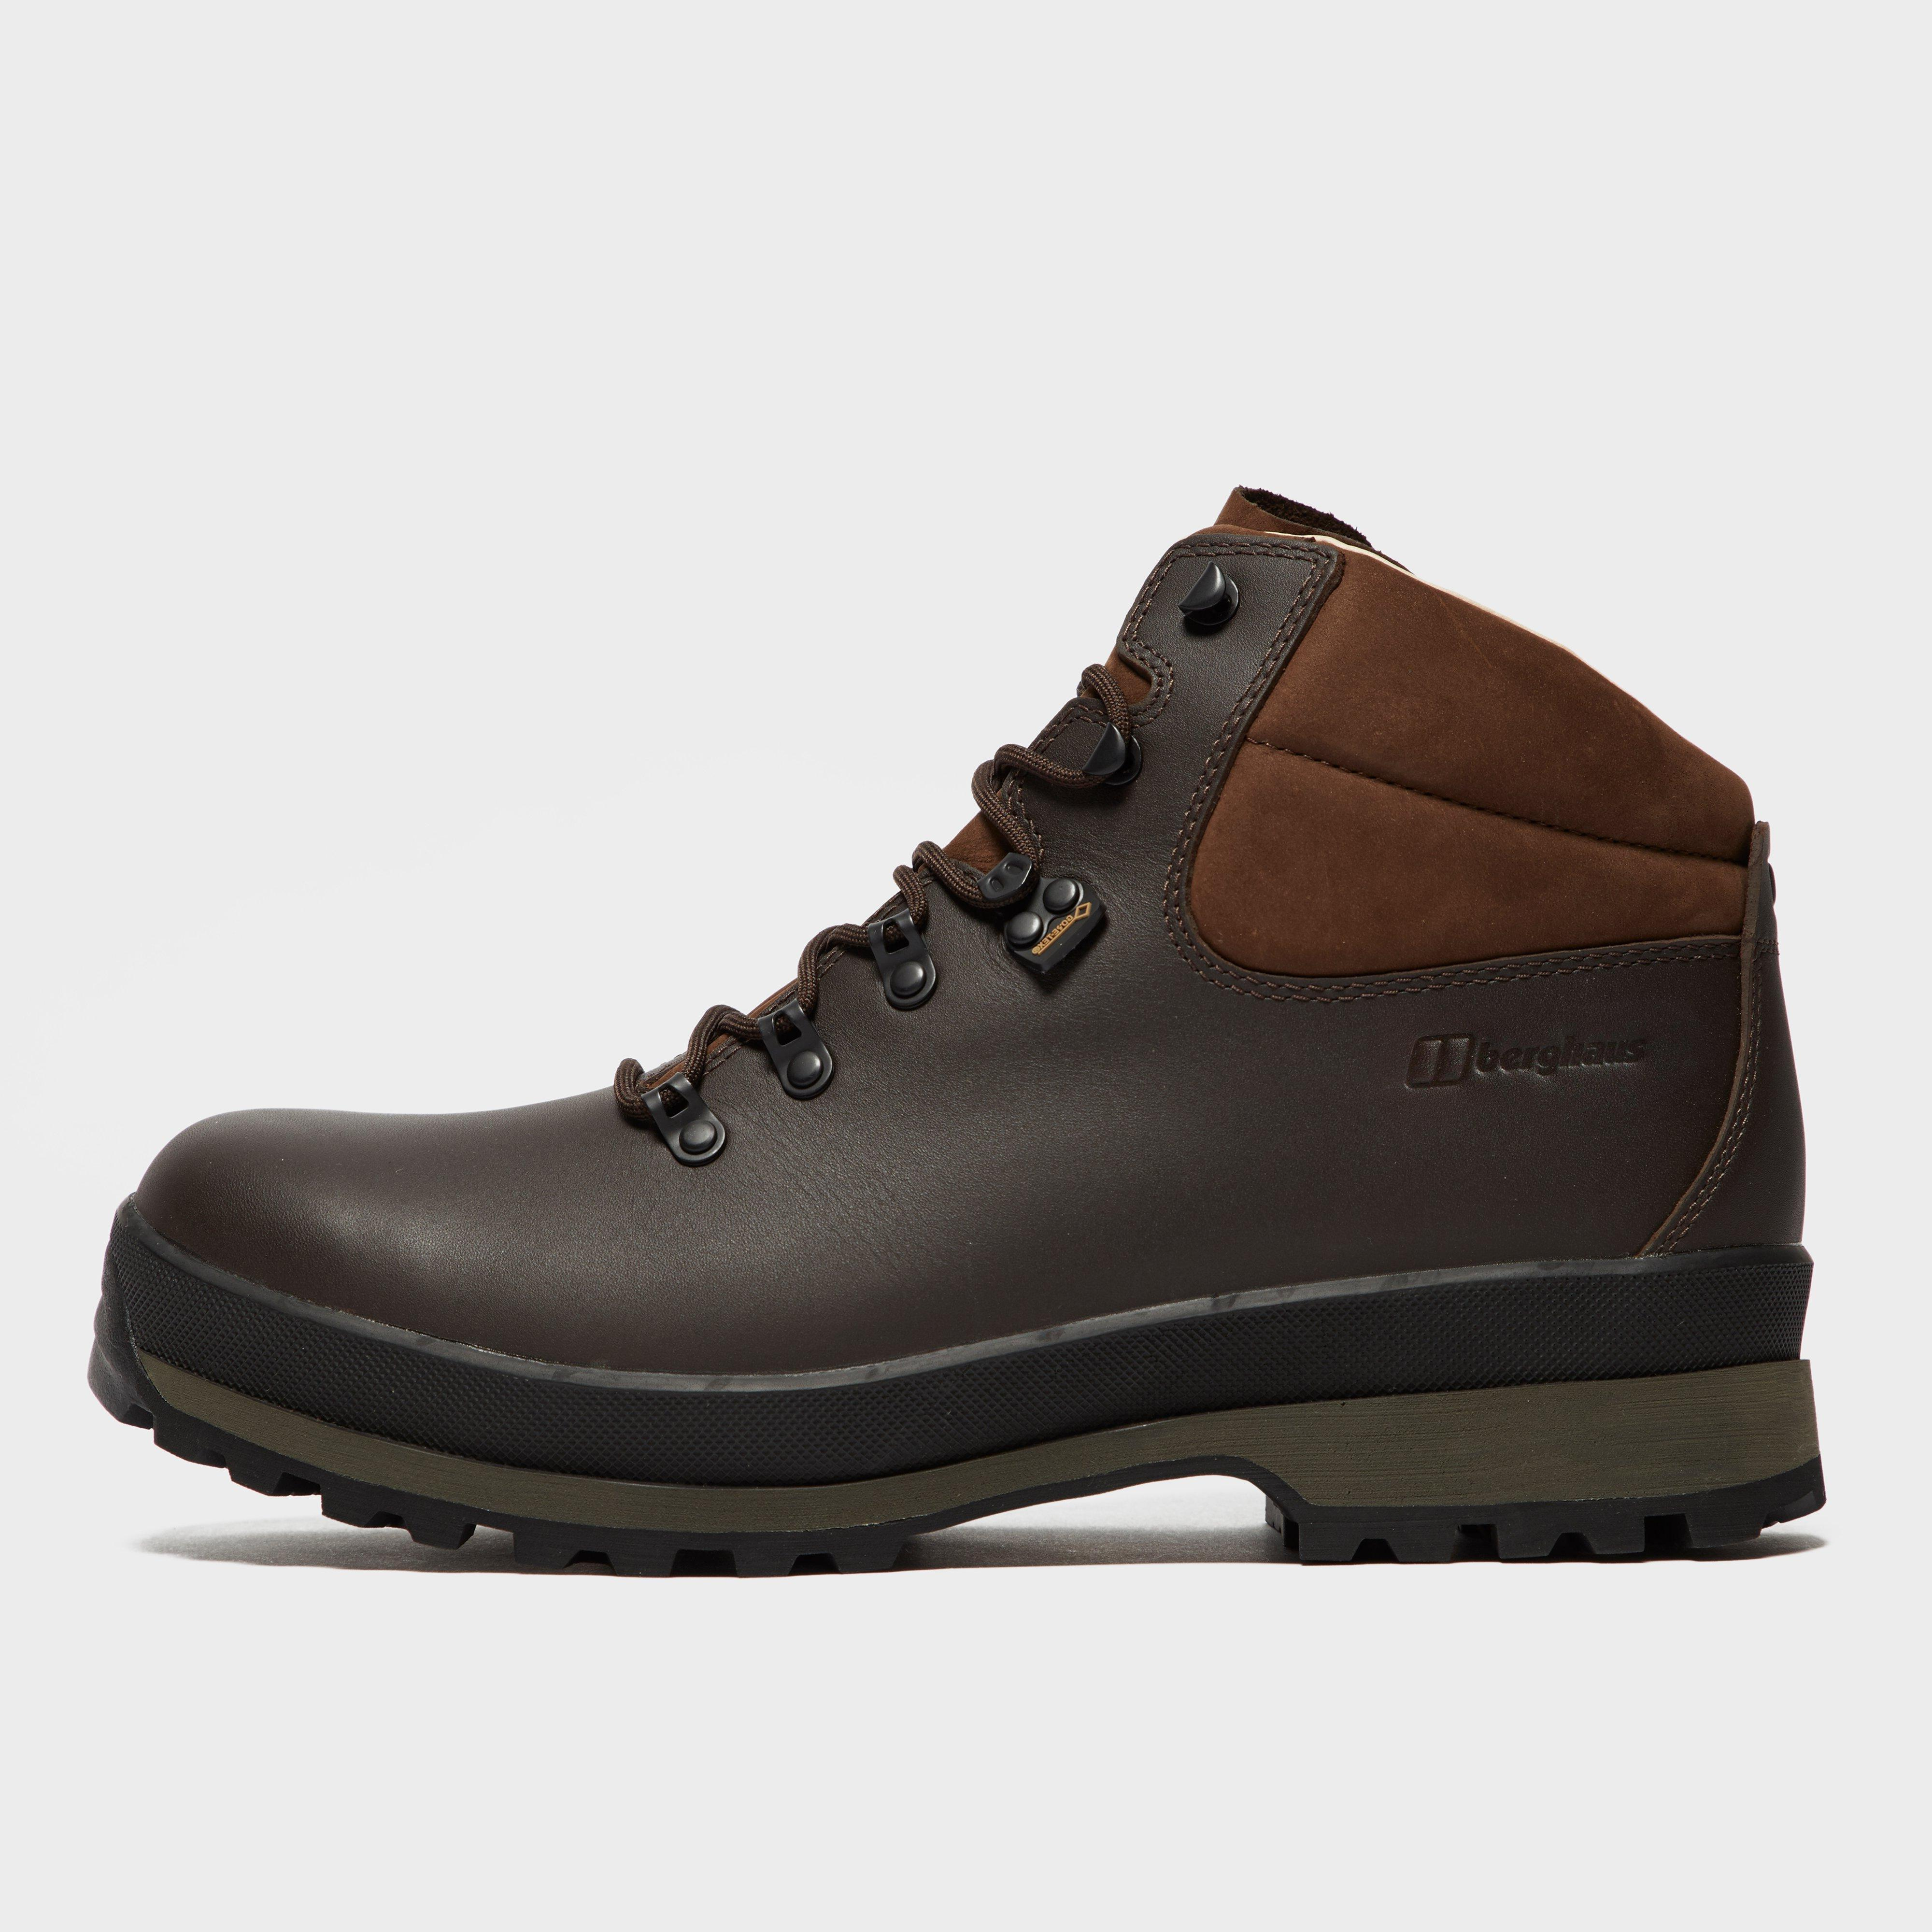 Berghaus Womens Supalite Ii Gore-tex Hiking Boot - Brown  Brown